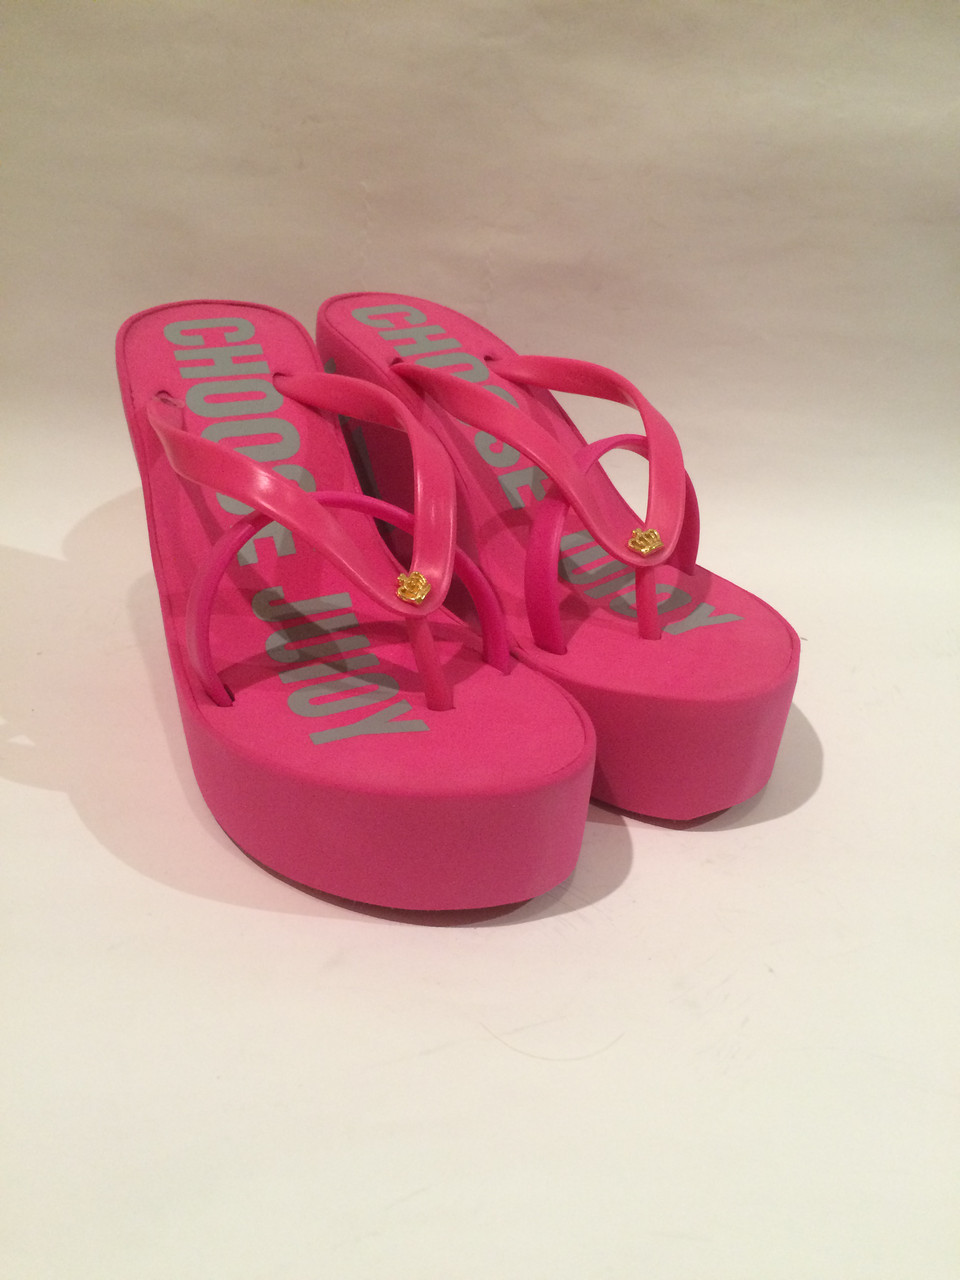 Розовые шлепанцы Juicy Couture (Джуси Кутюр) , копия